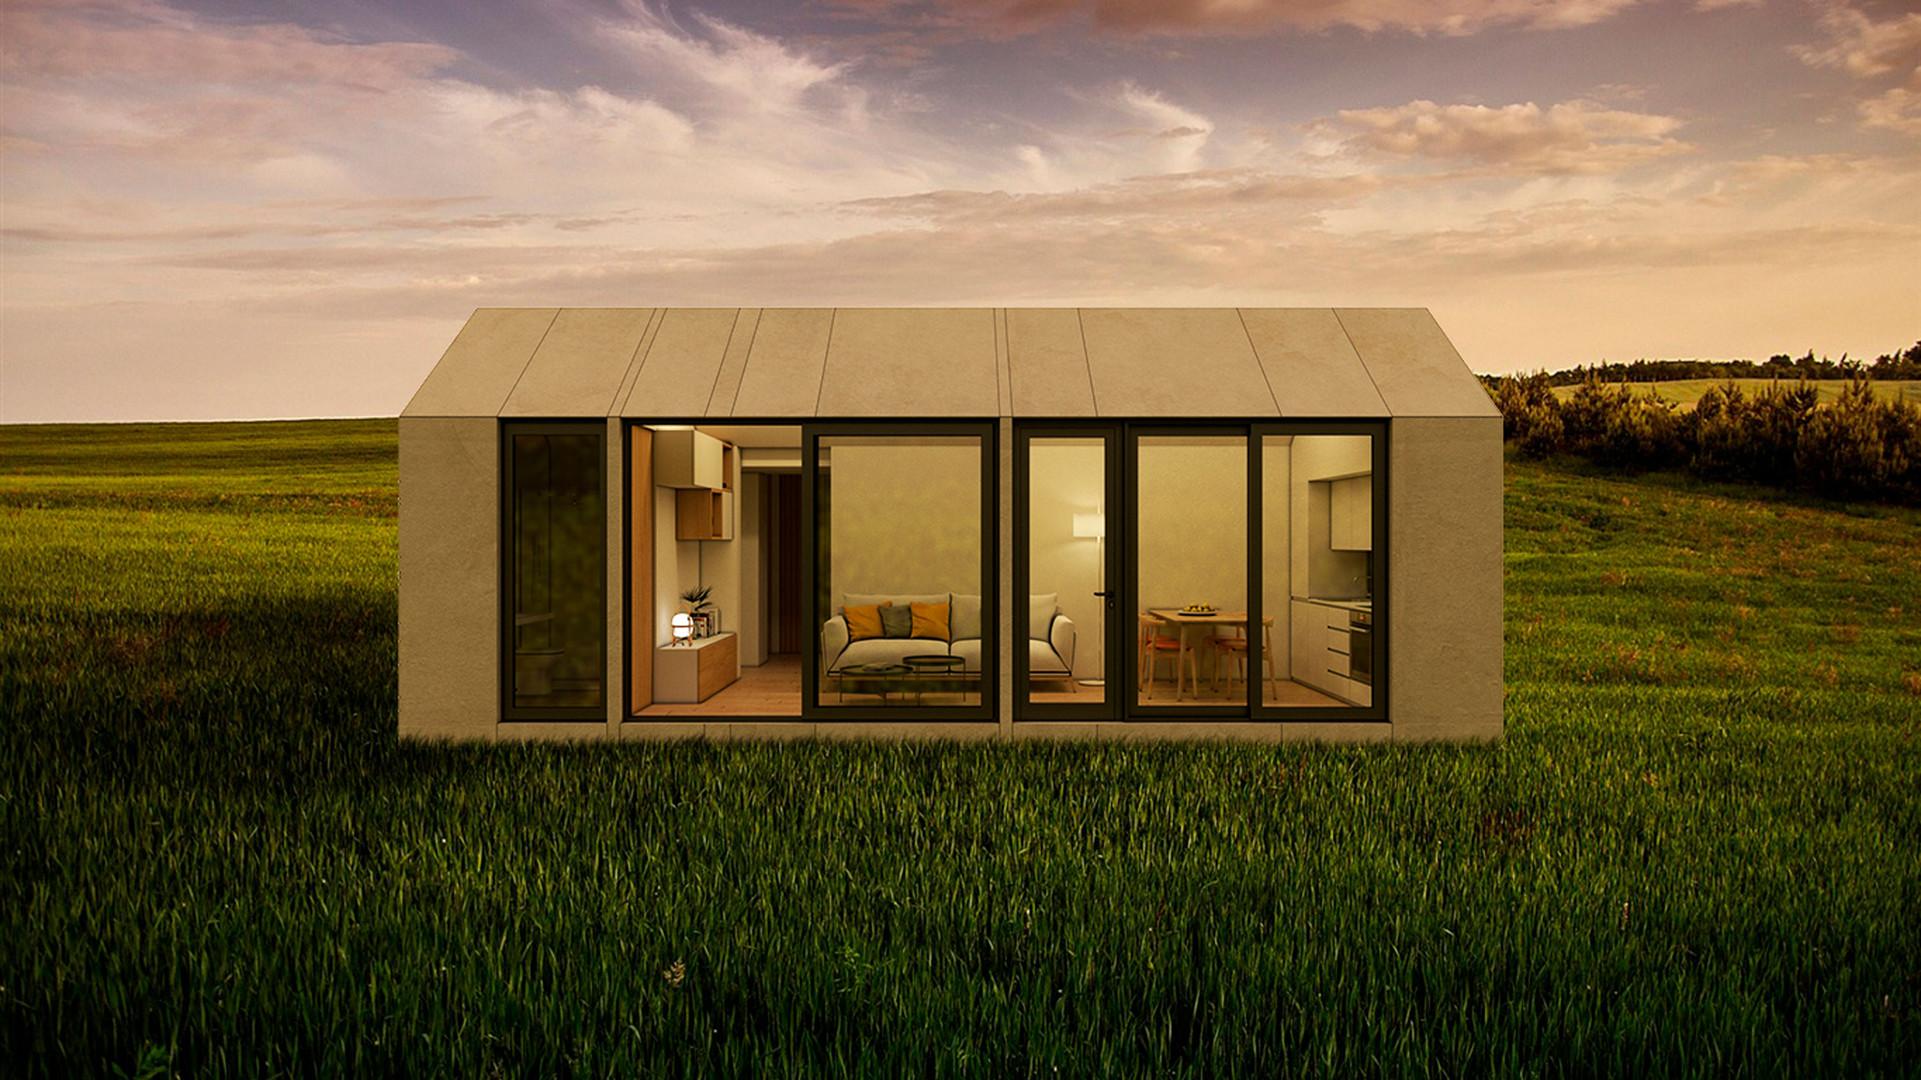 arquitectura-senmais-19.24.03.jpg